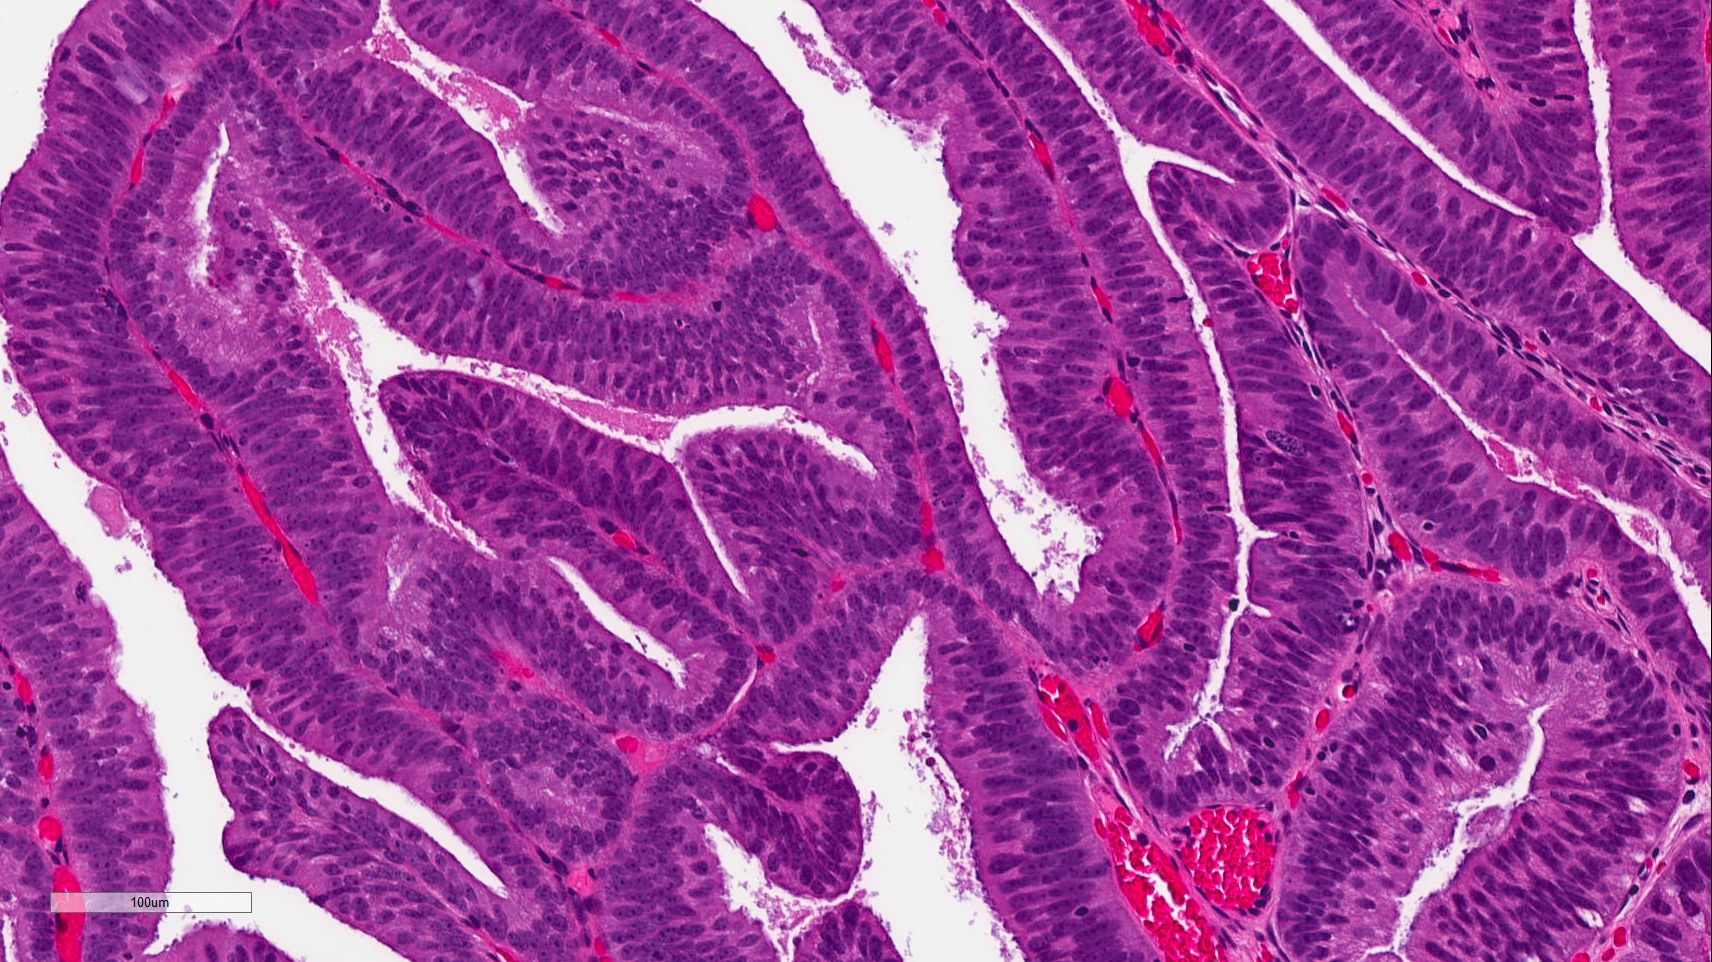 papillary lesion prostate ce analize se fac pt oxiuri